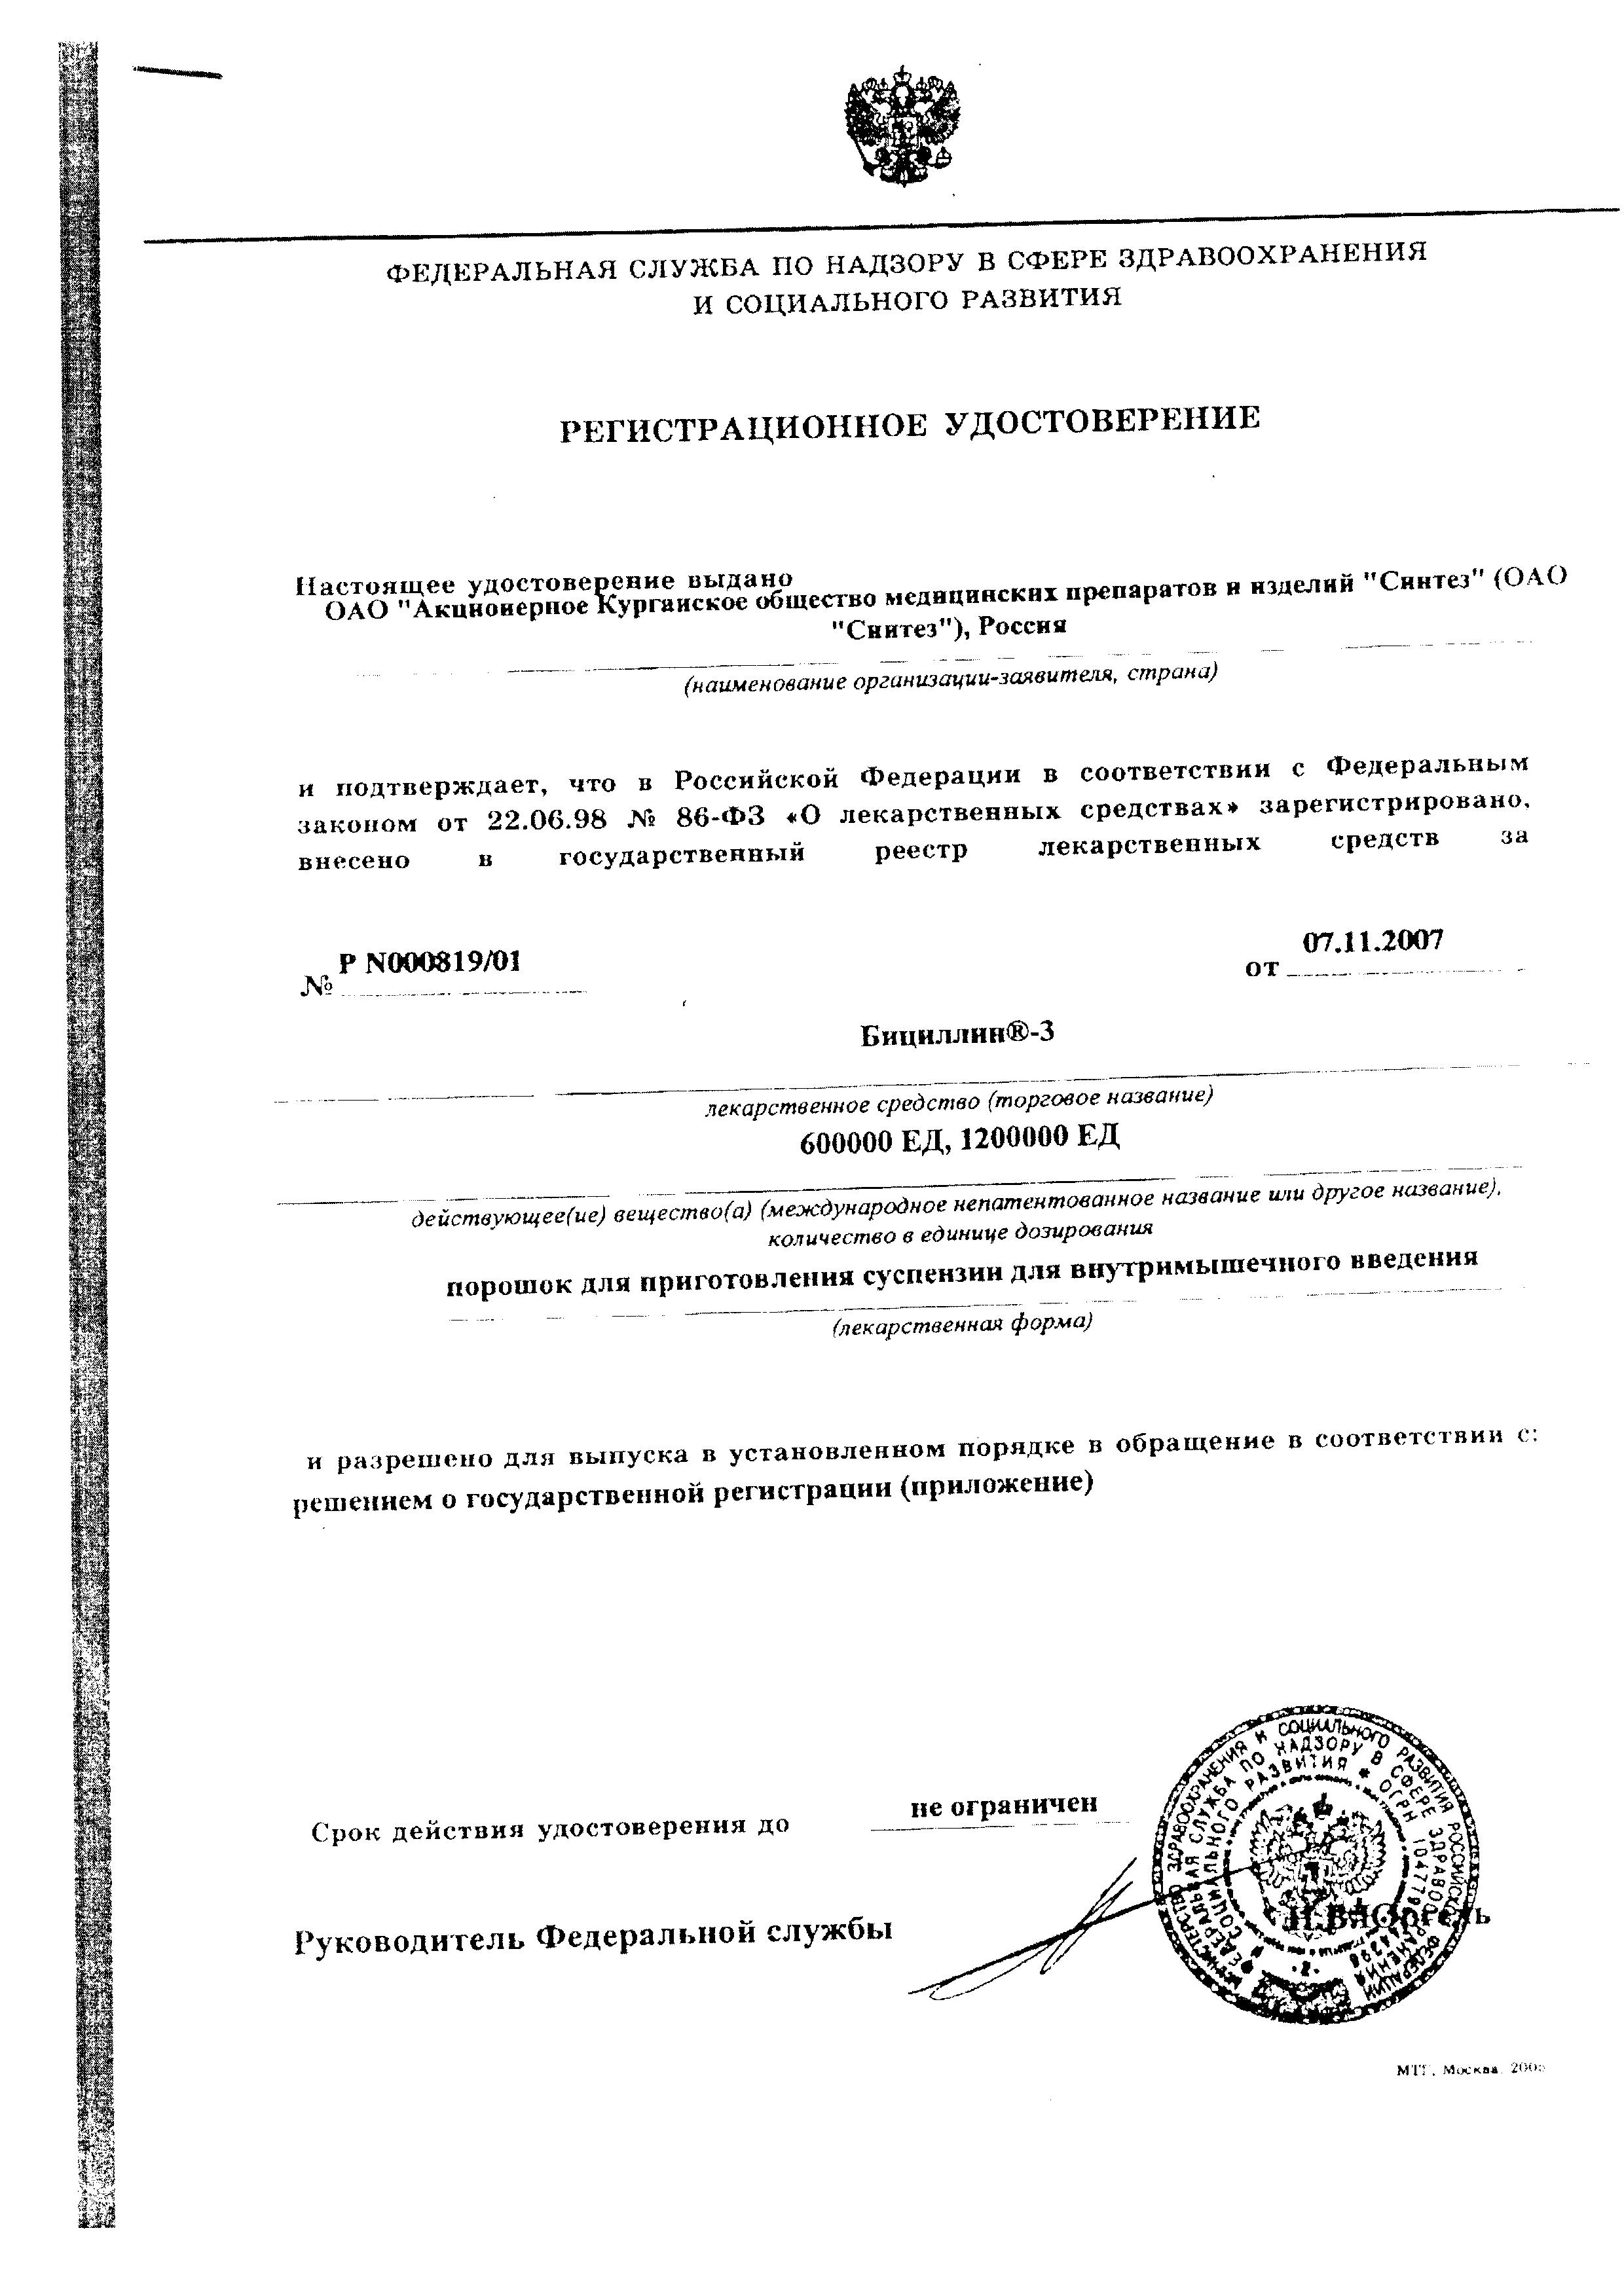 Бициллин-3 сертификат